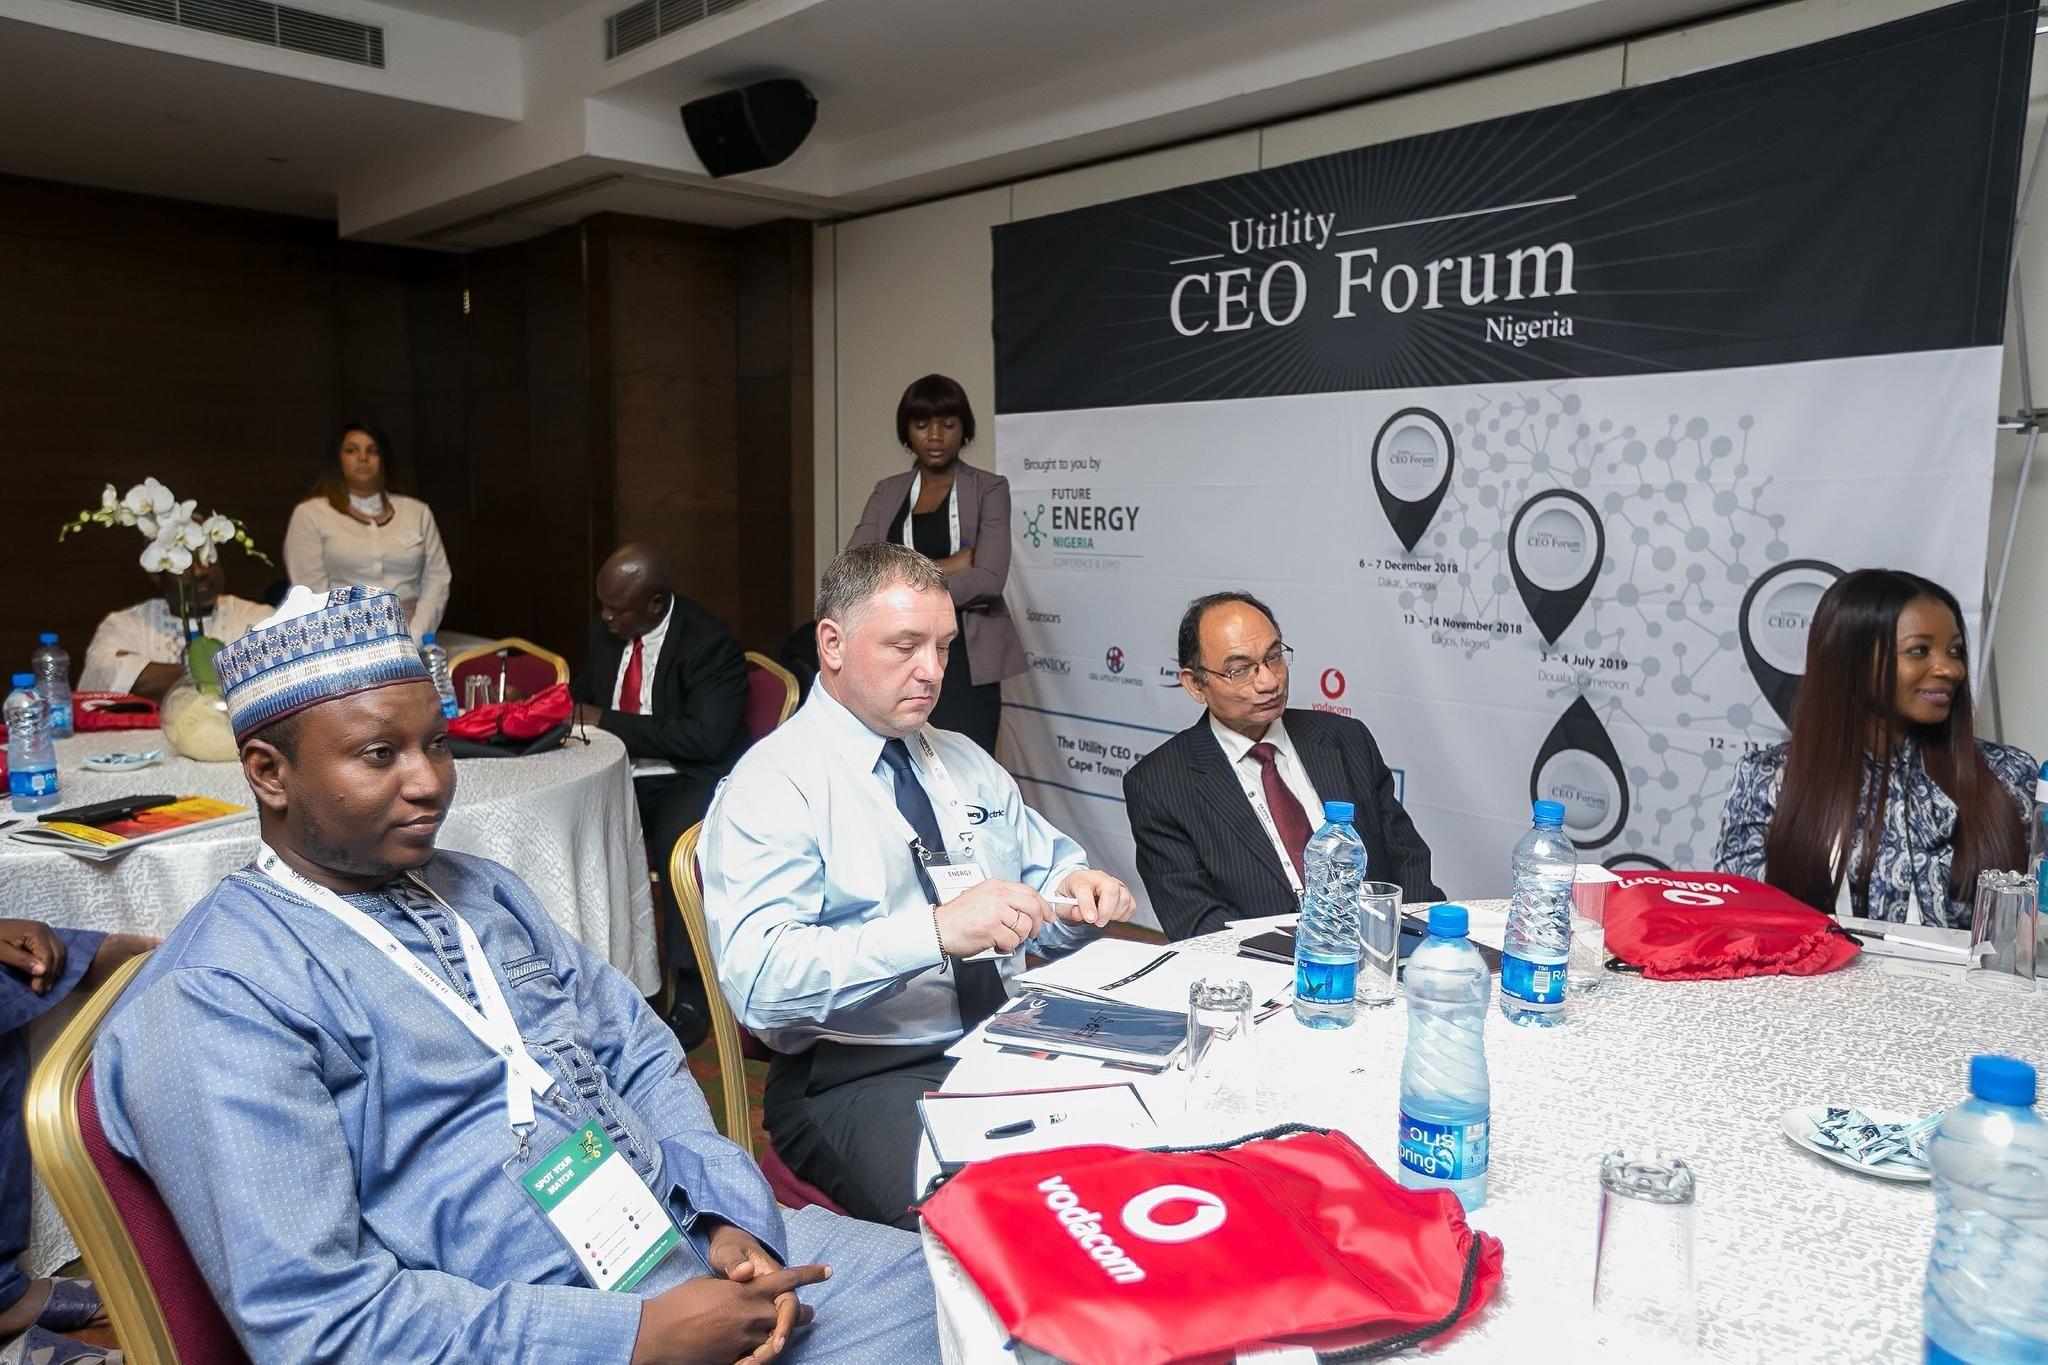 Utility CEO Forum